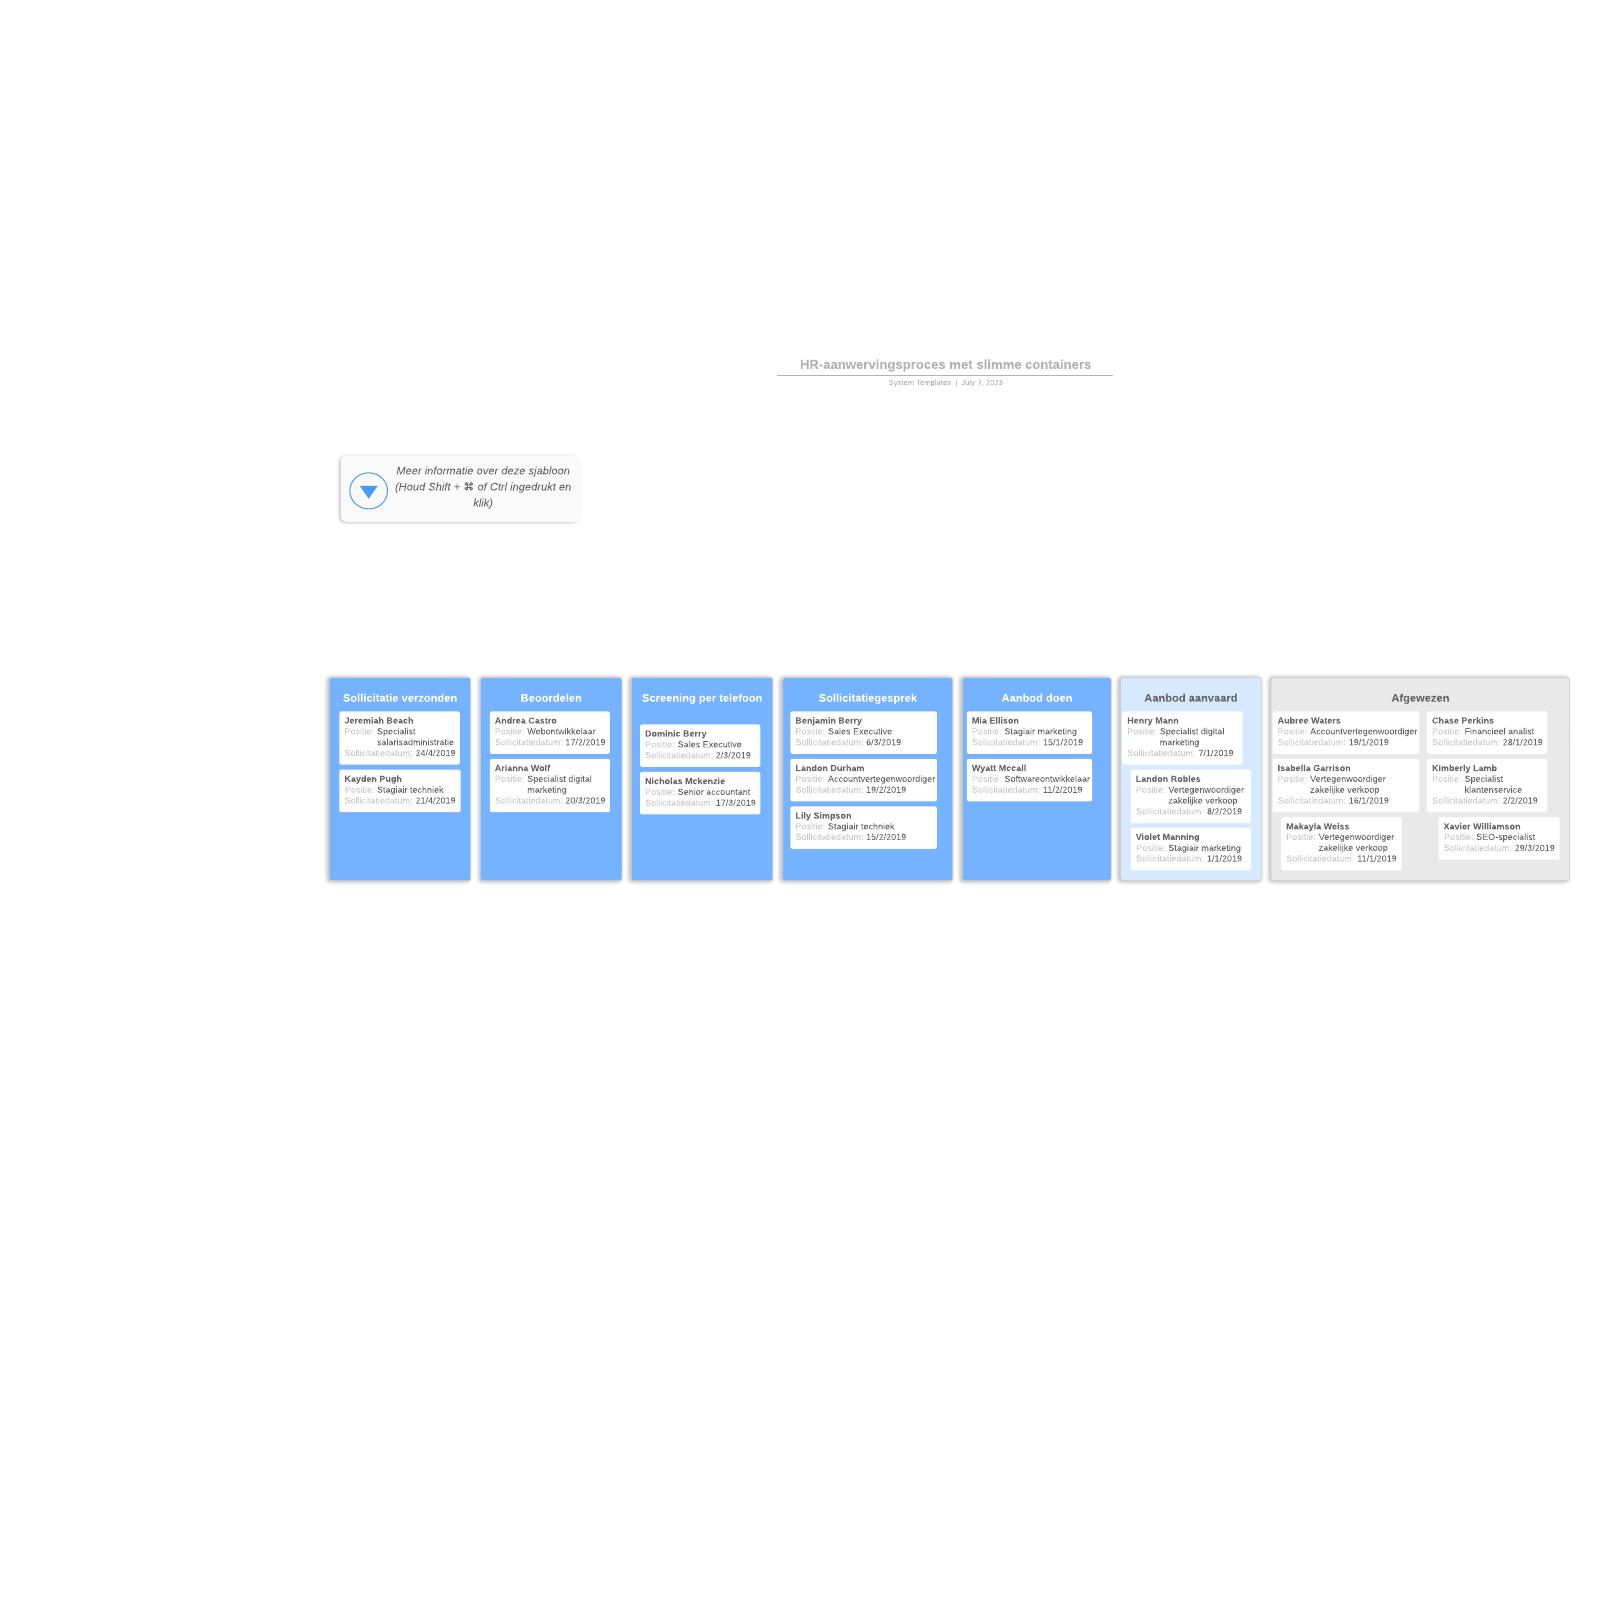 HR-aanwervingsproces met slimme containers